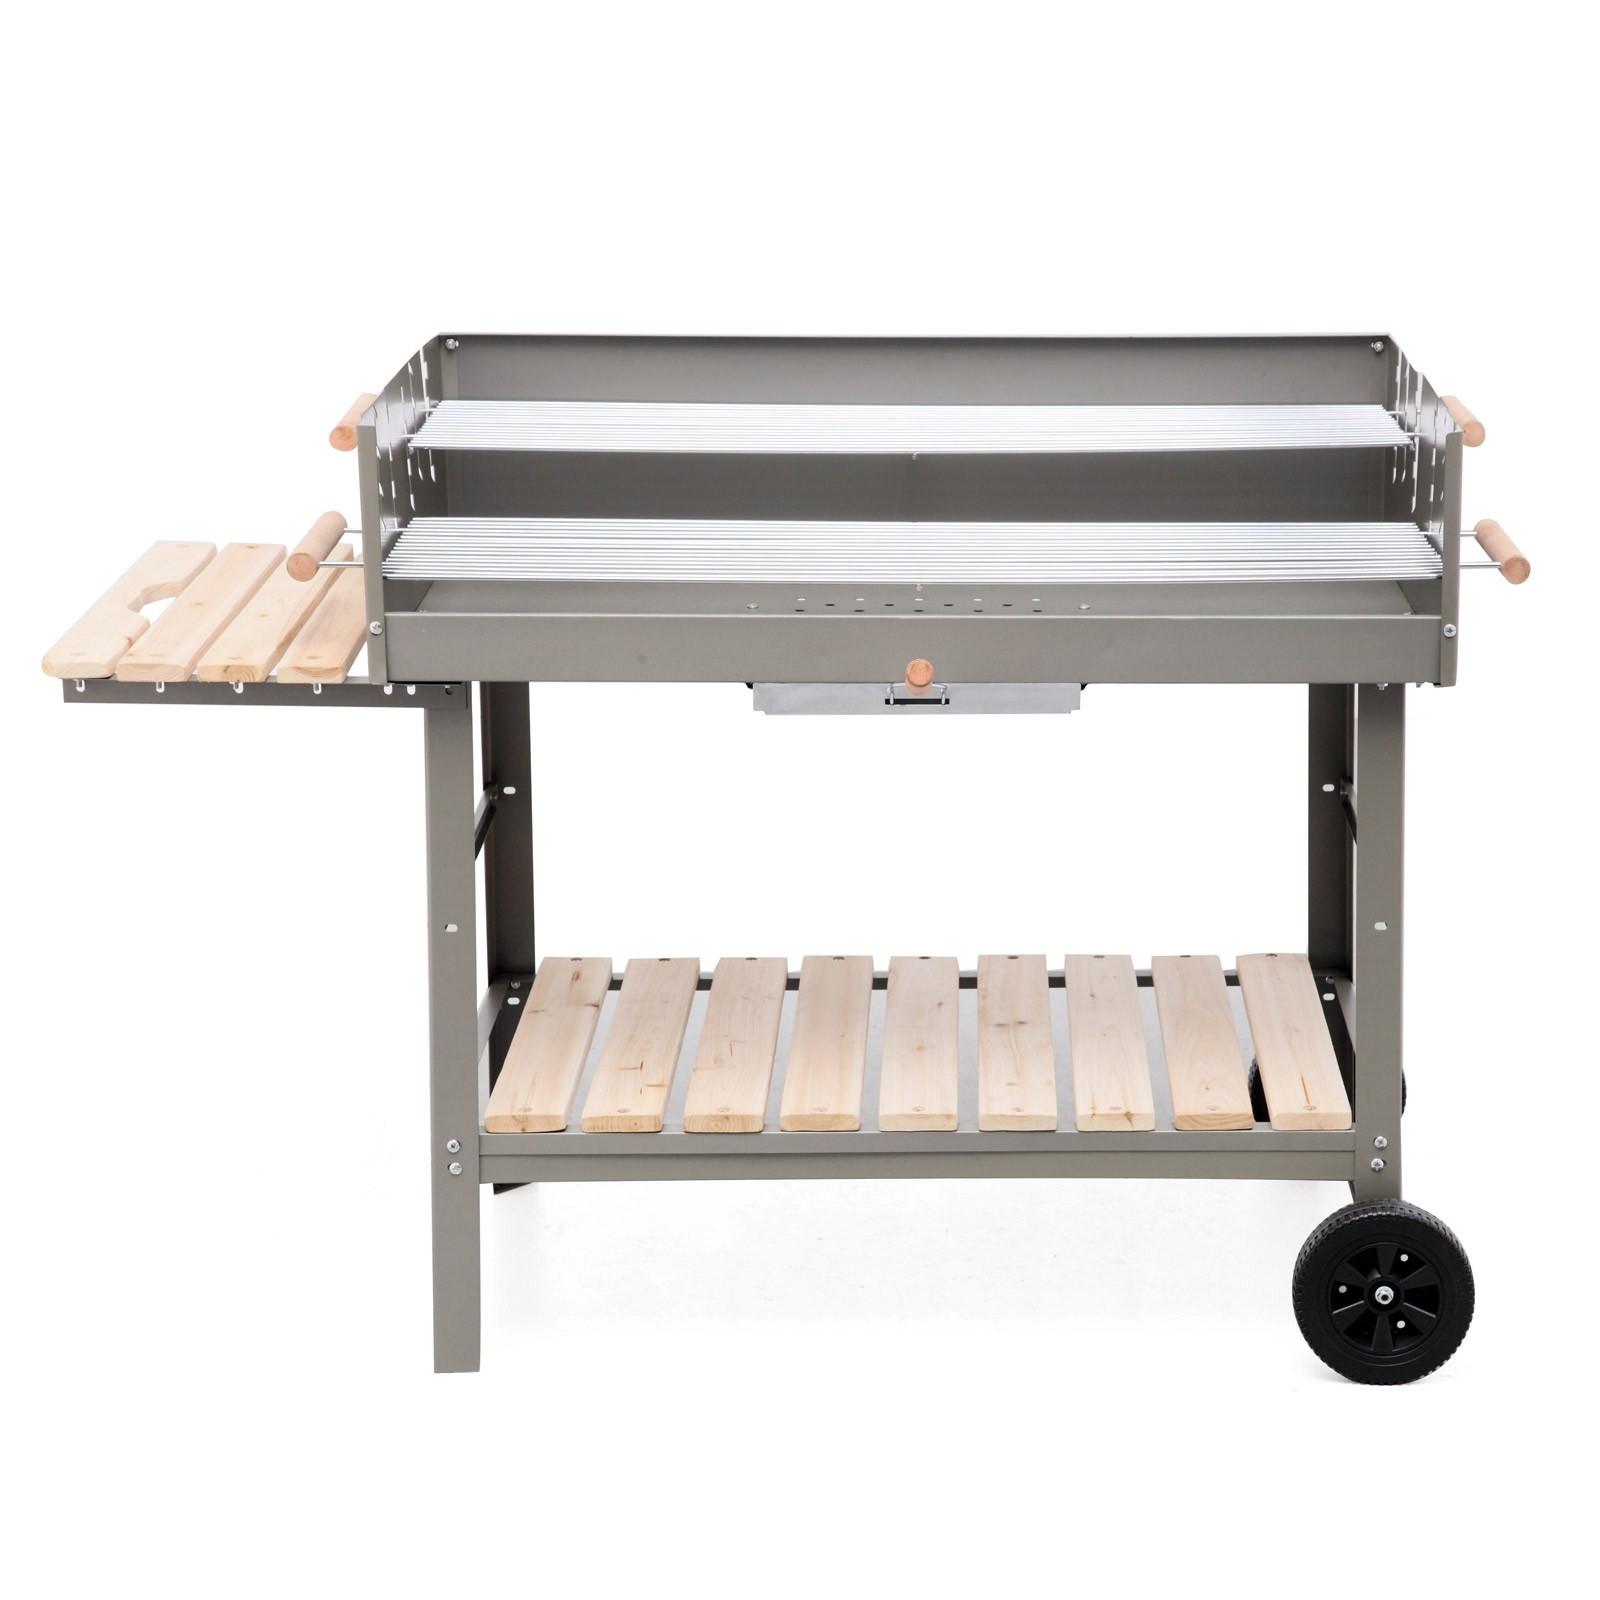 tepro holzkohlegrill grillwagen bbq grill kohlegrill jackson xxl fahrbar ebay. Black Bedroom Furniture Sets. Home Design Ideas